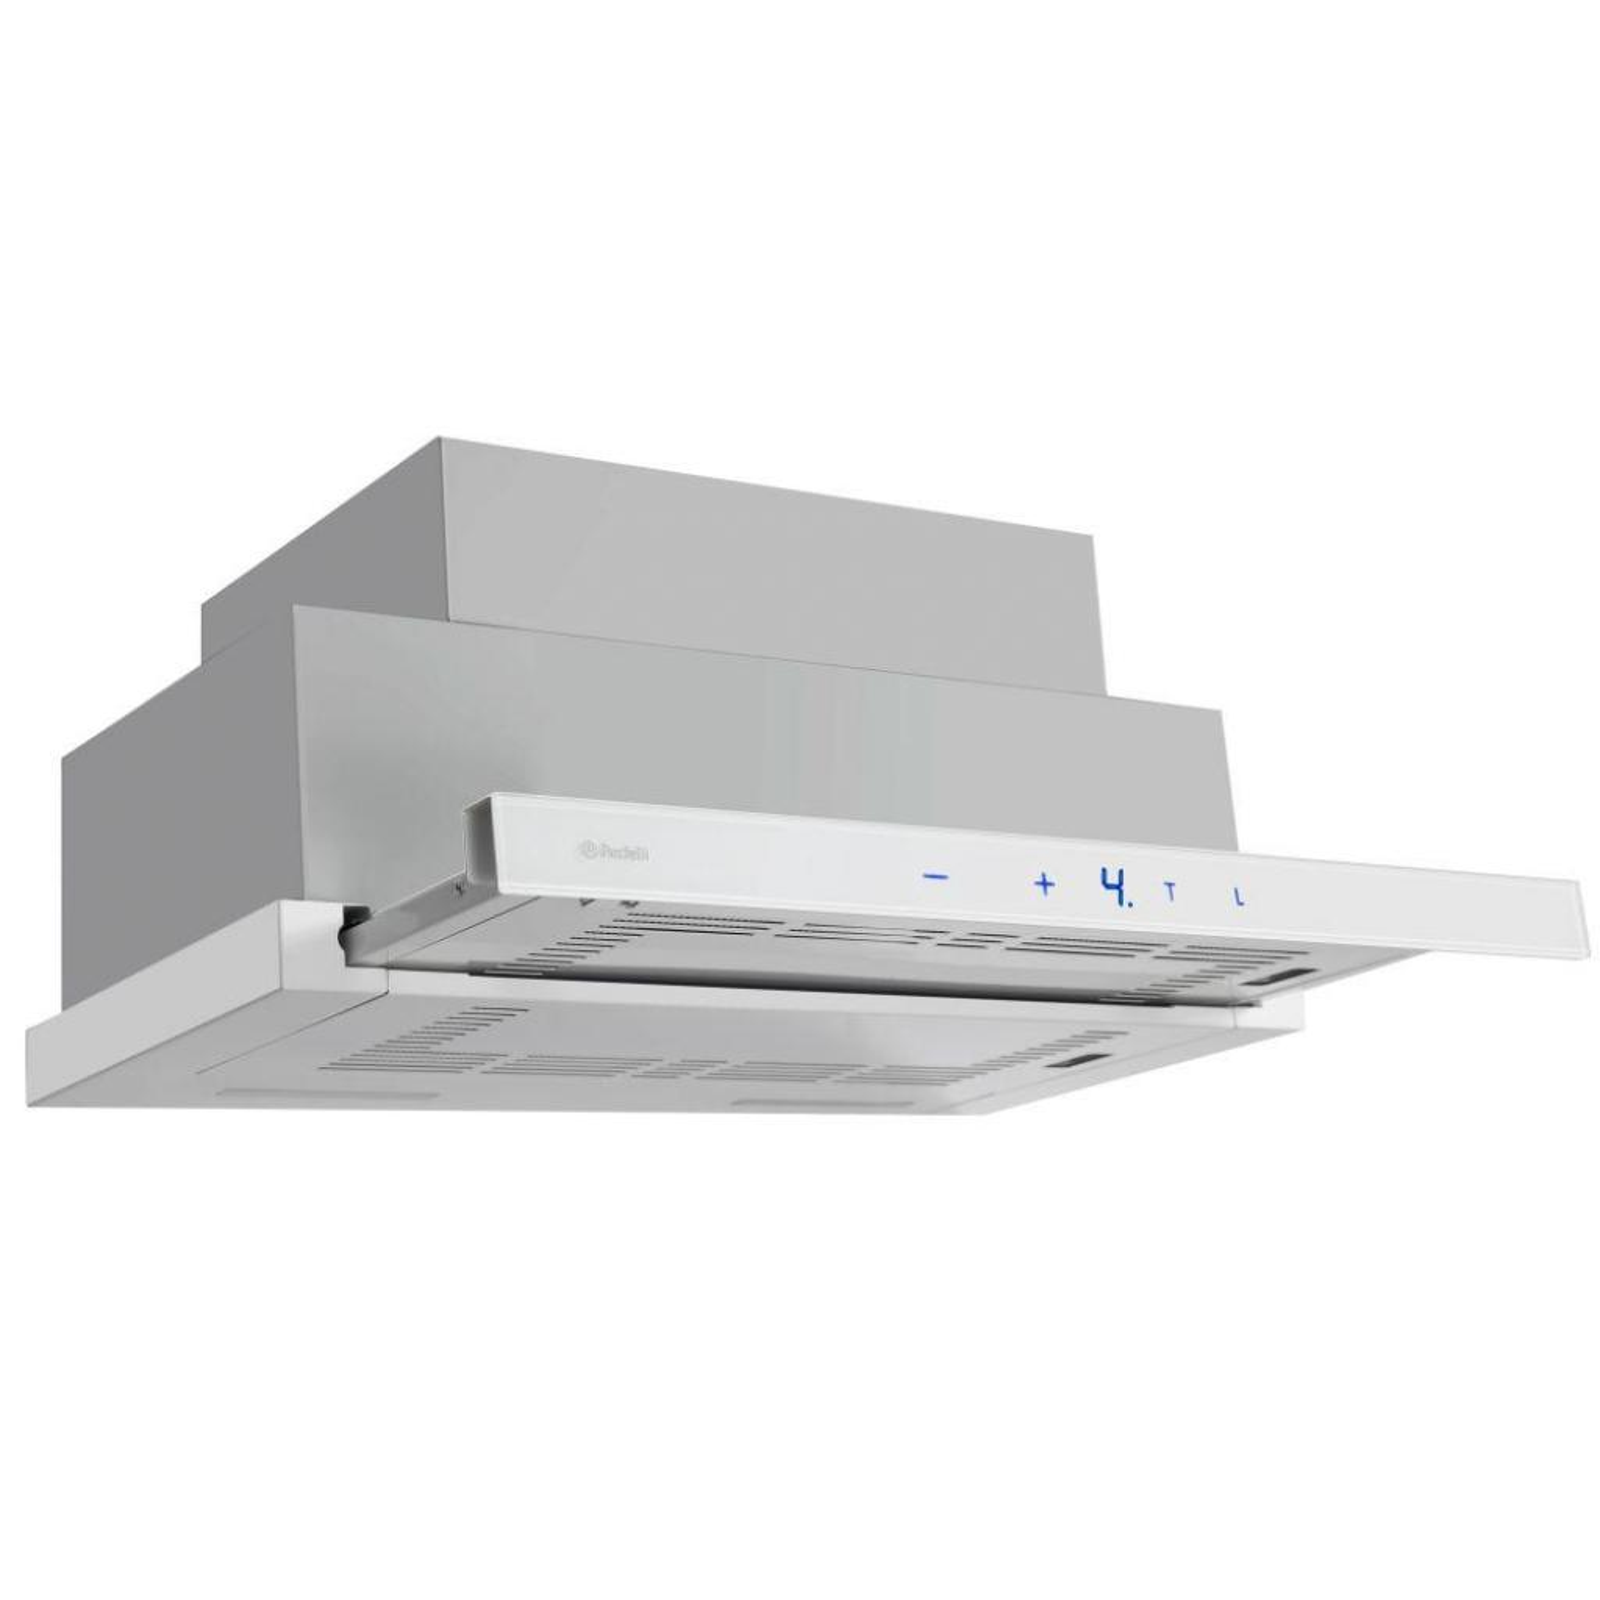 Вытяжка кухонная PERFELLI TLS 6833 W LED Strip изображение 3